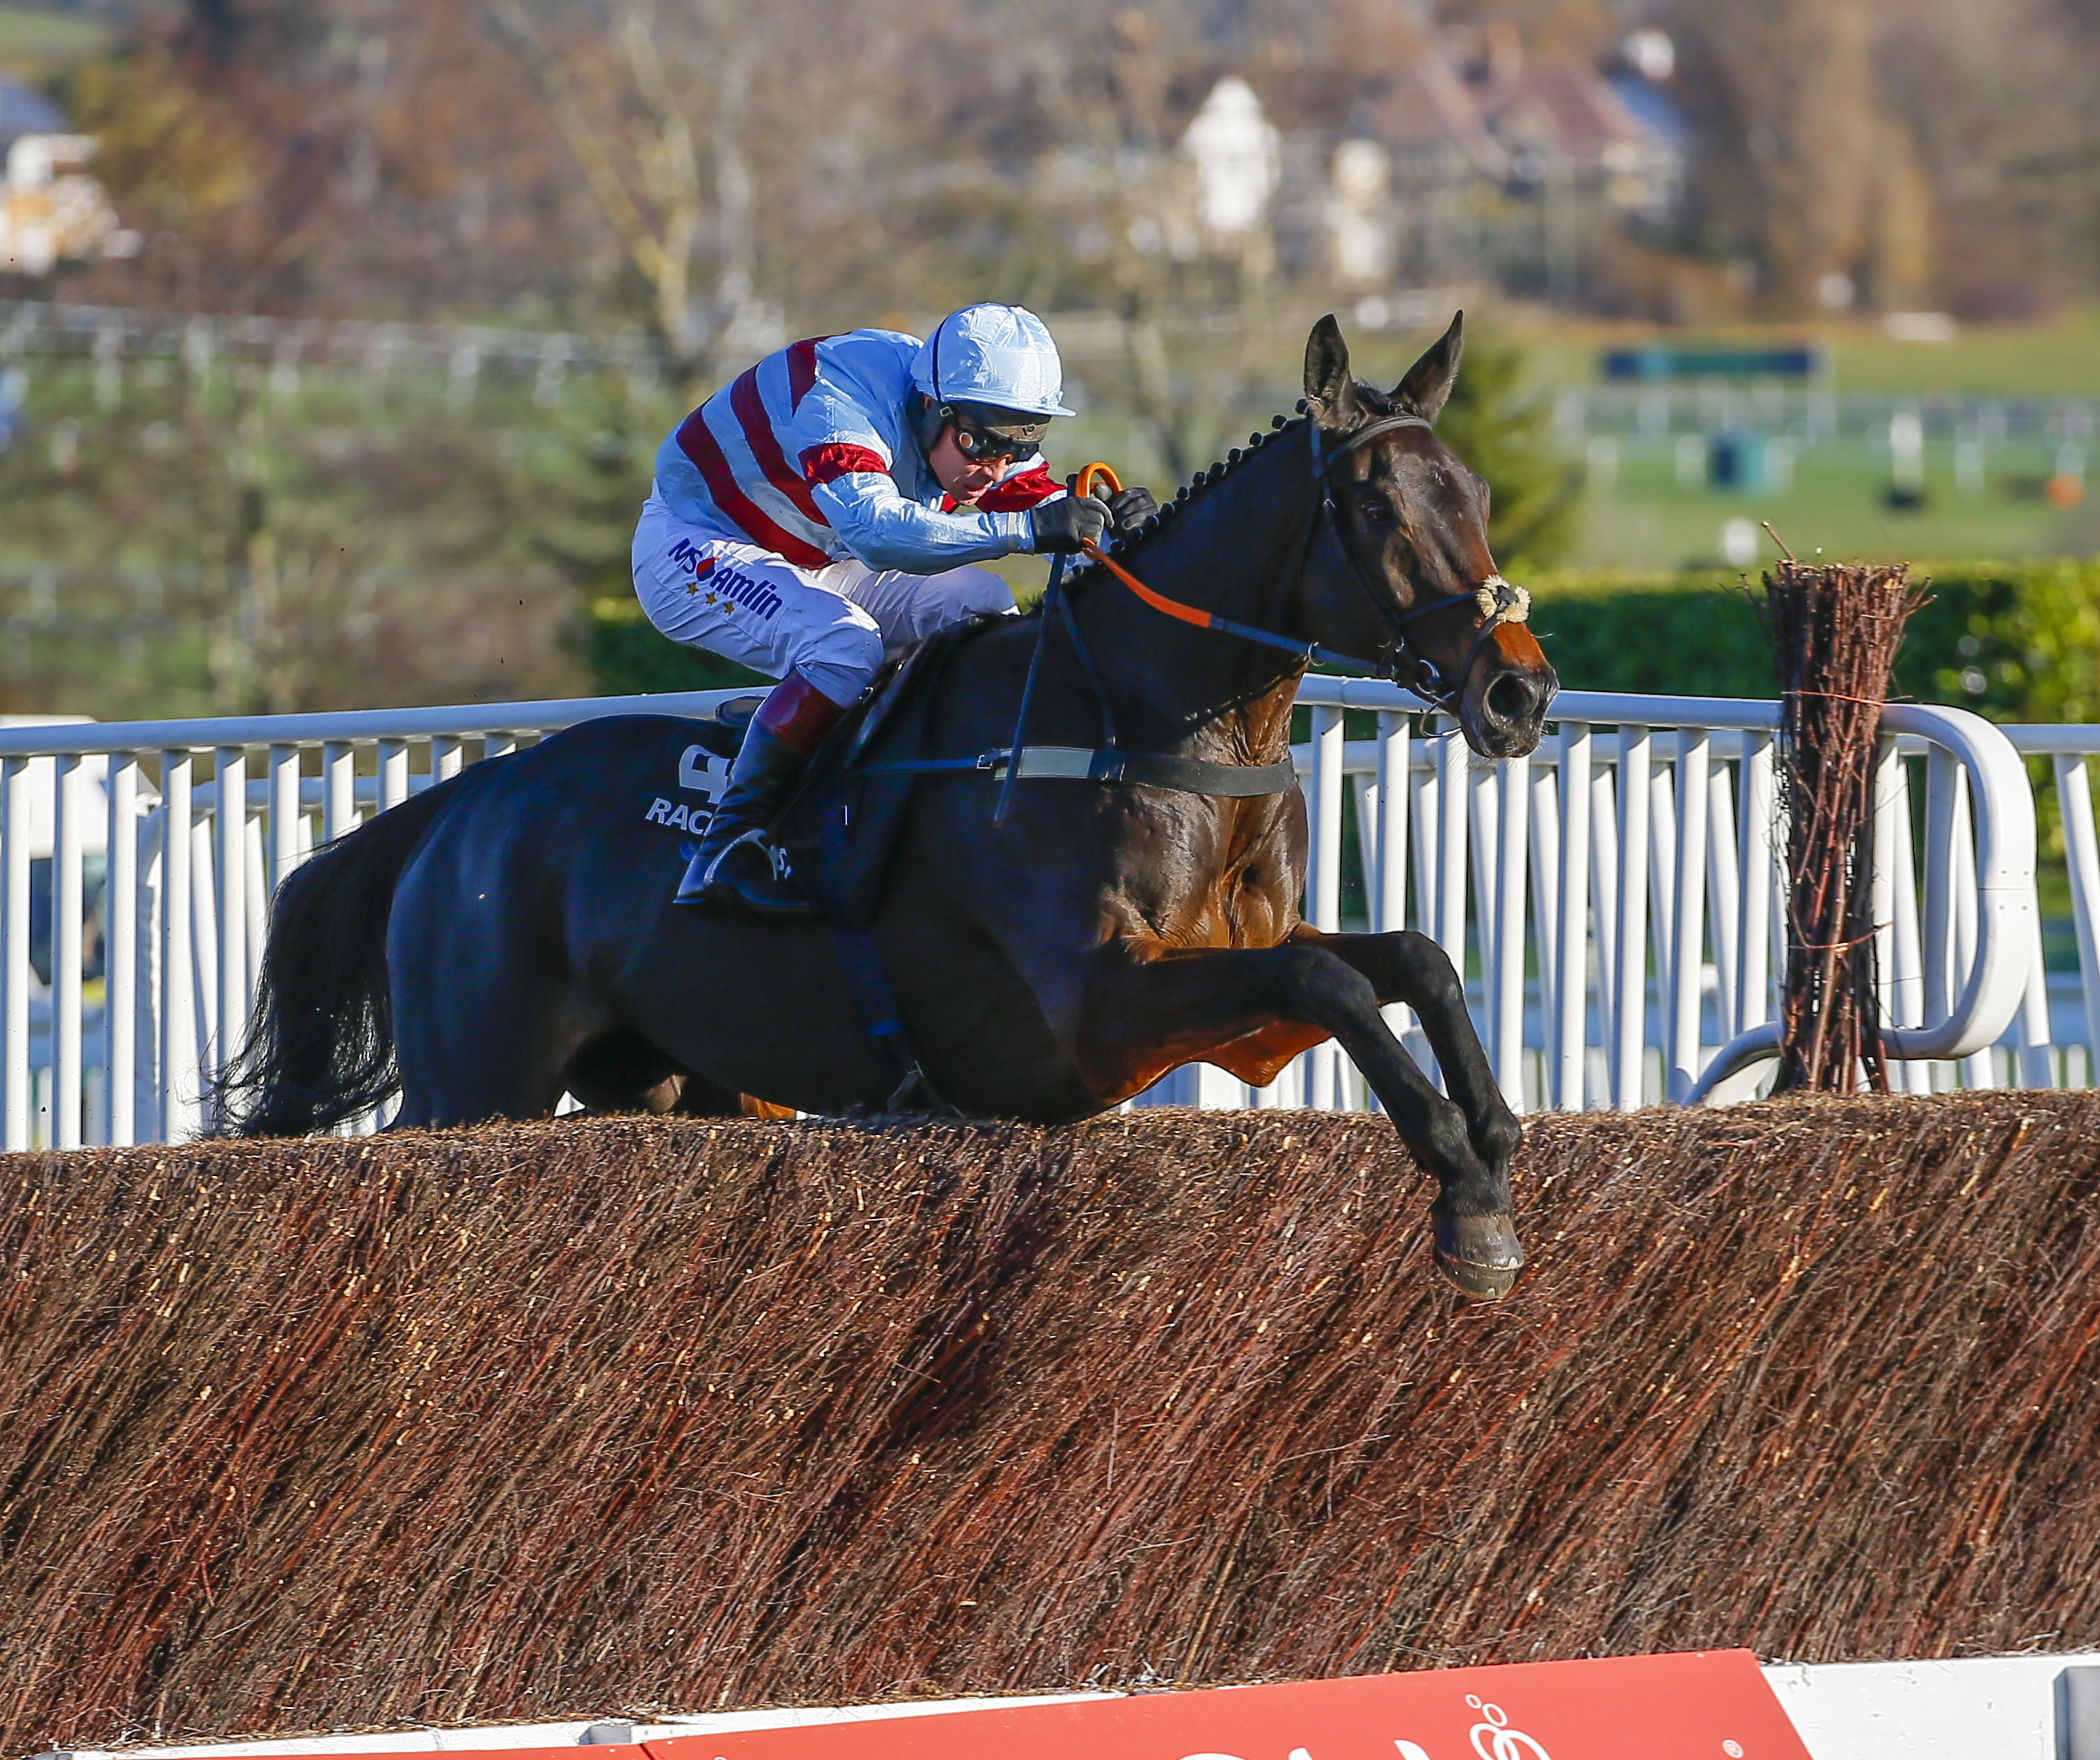 racehorse trainer